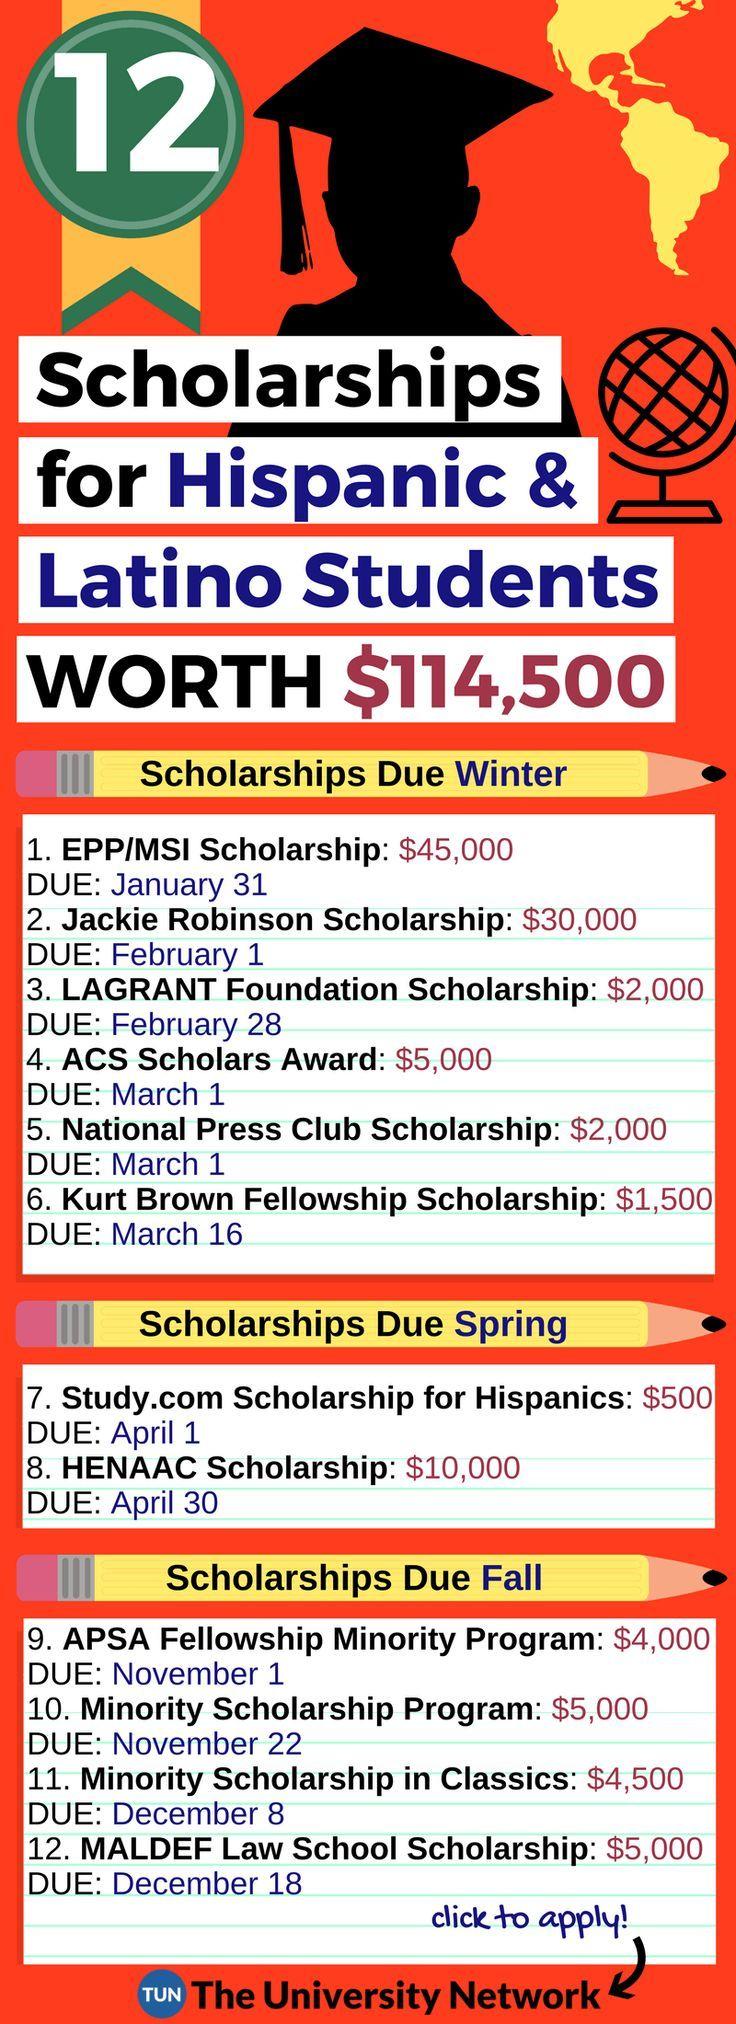 006 12 Scholarships for Hispanics and Latinos Totalling